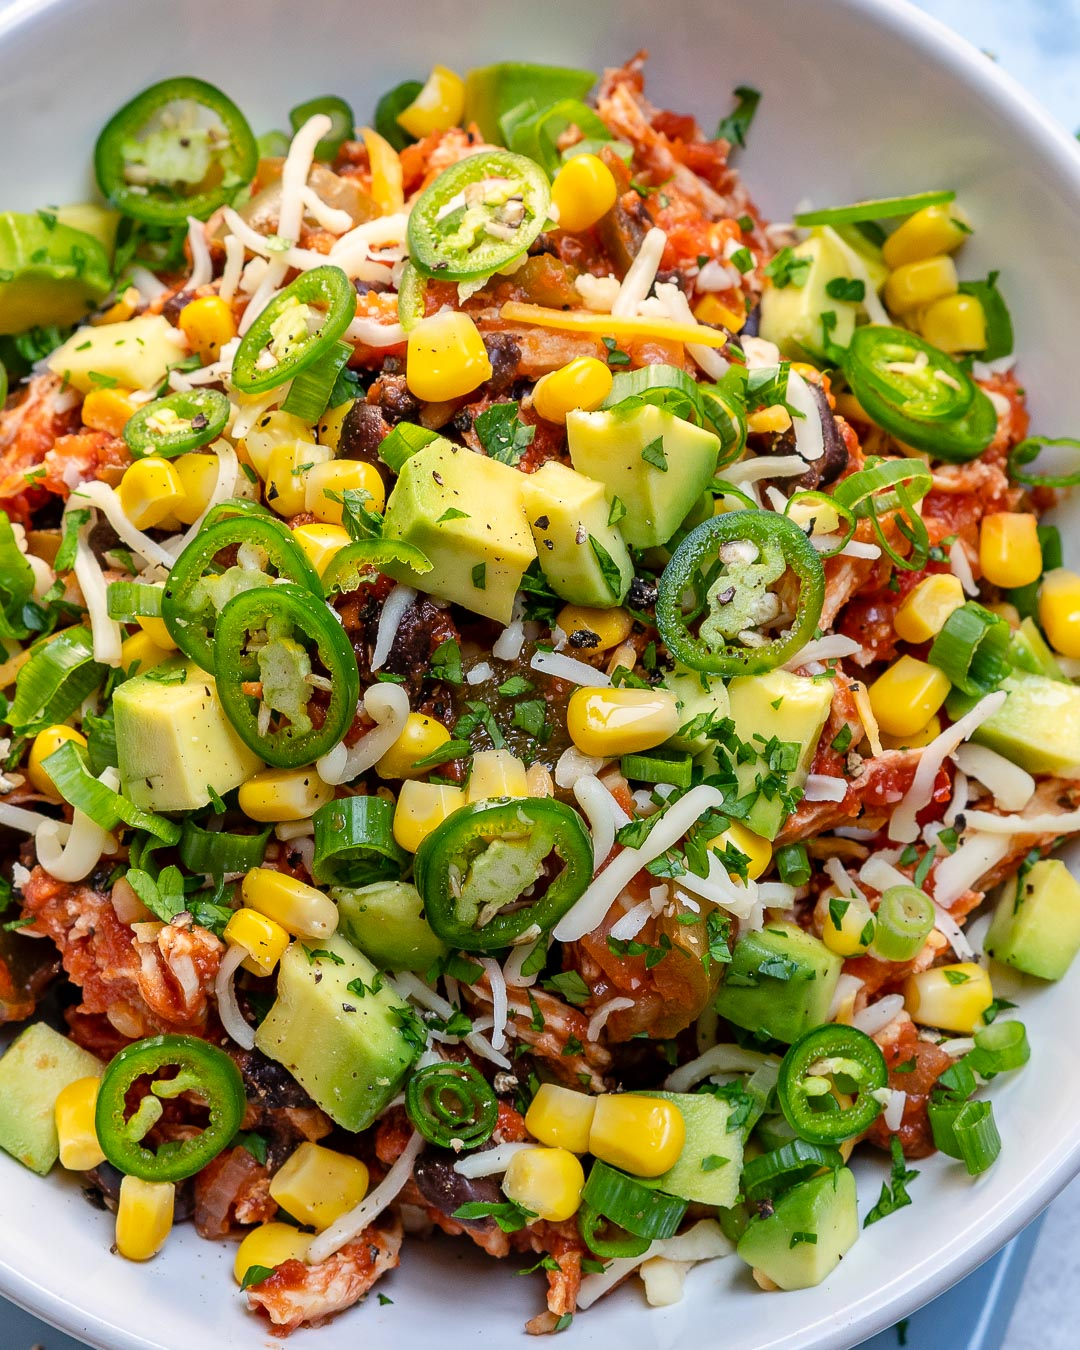 Healthy Crockpot Mexican Chicken Bowls